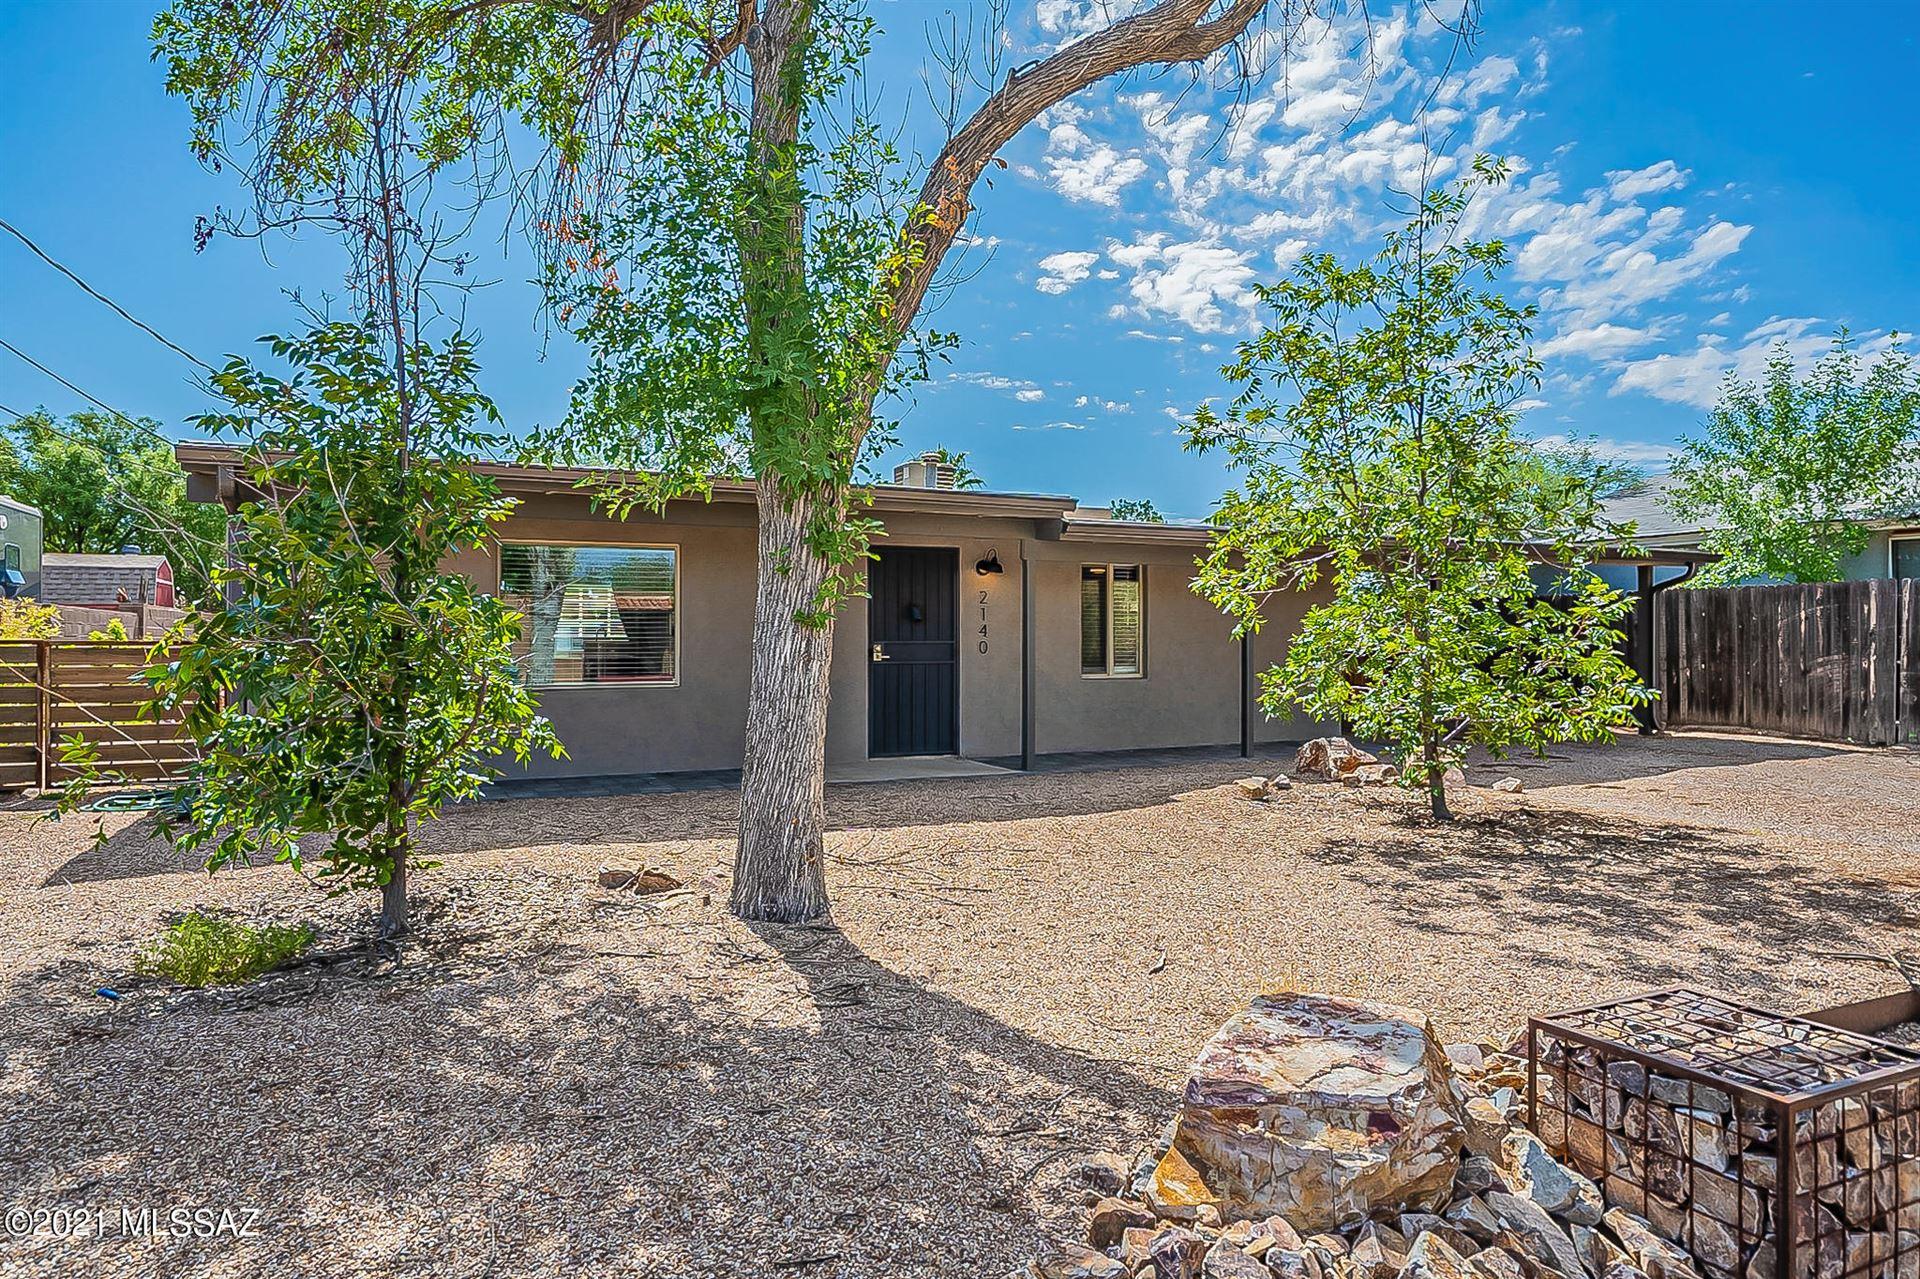 2140 N Northway Avenue, Tucson, AZ 85716 - MLS#: 22118908